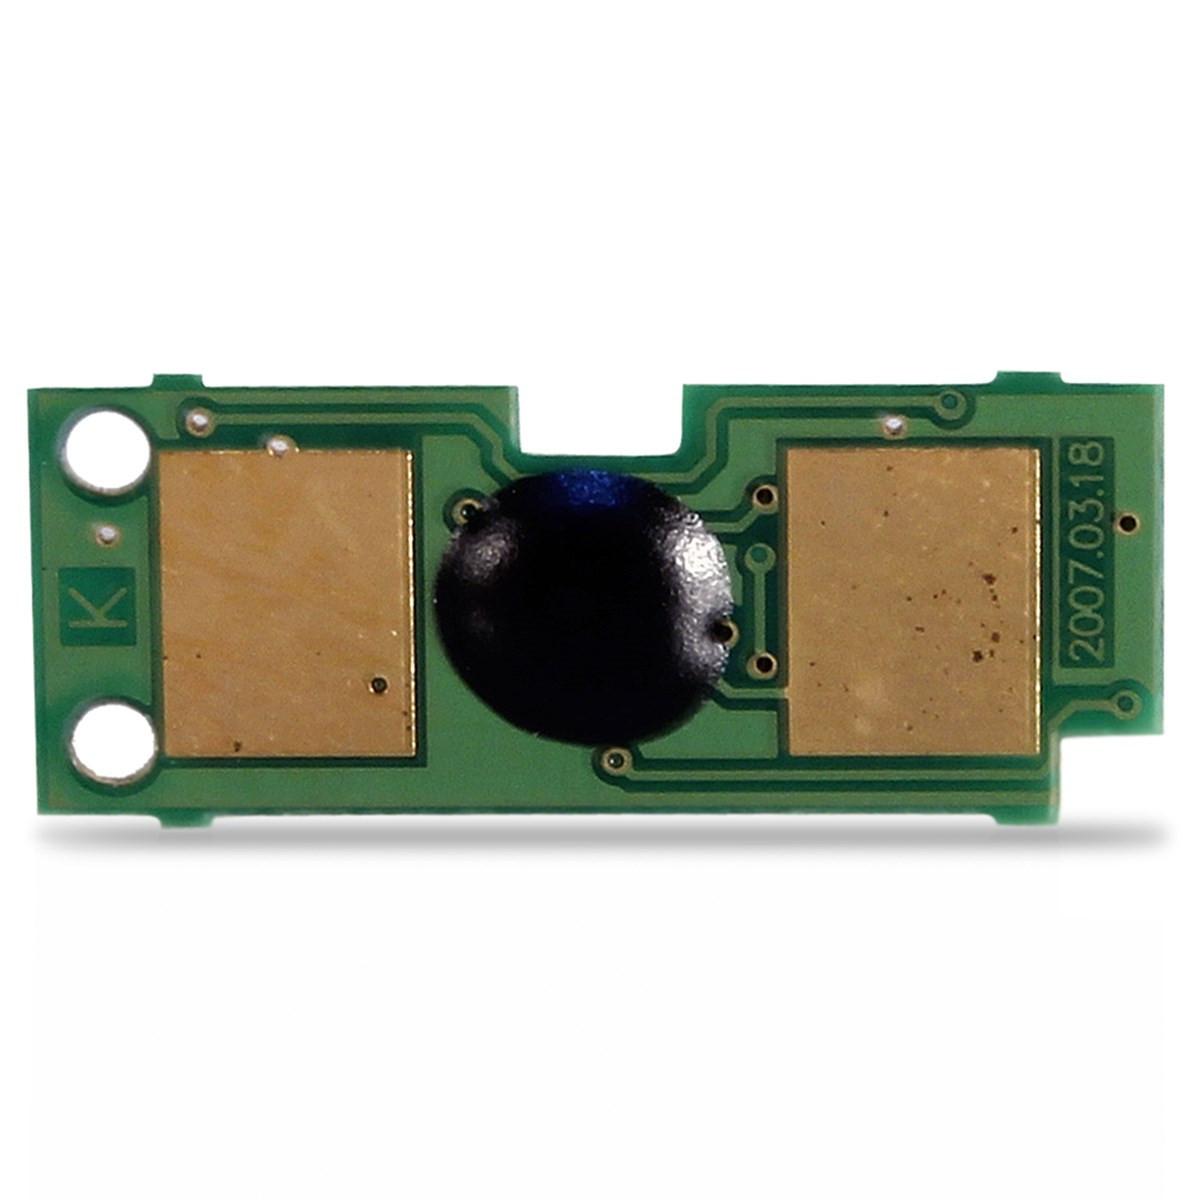 Chip HP Q3960A 3960A Preto | LaserJet Color 2820 2830 2840 2550L 2550N 2550LN | 4.000 páginas